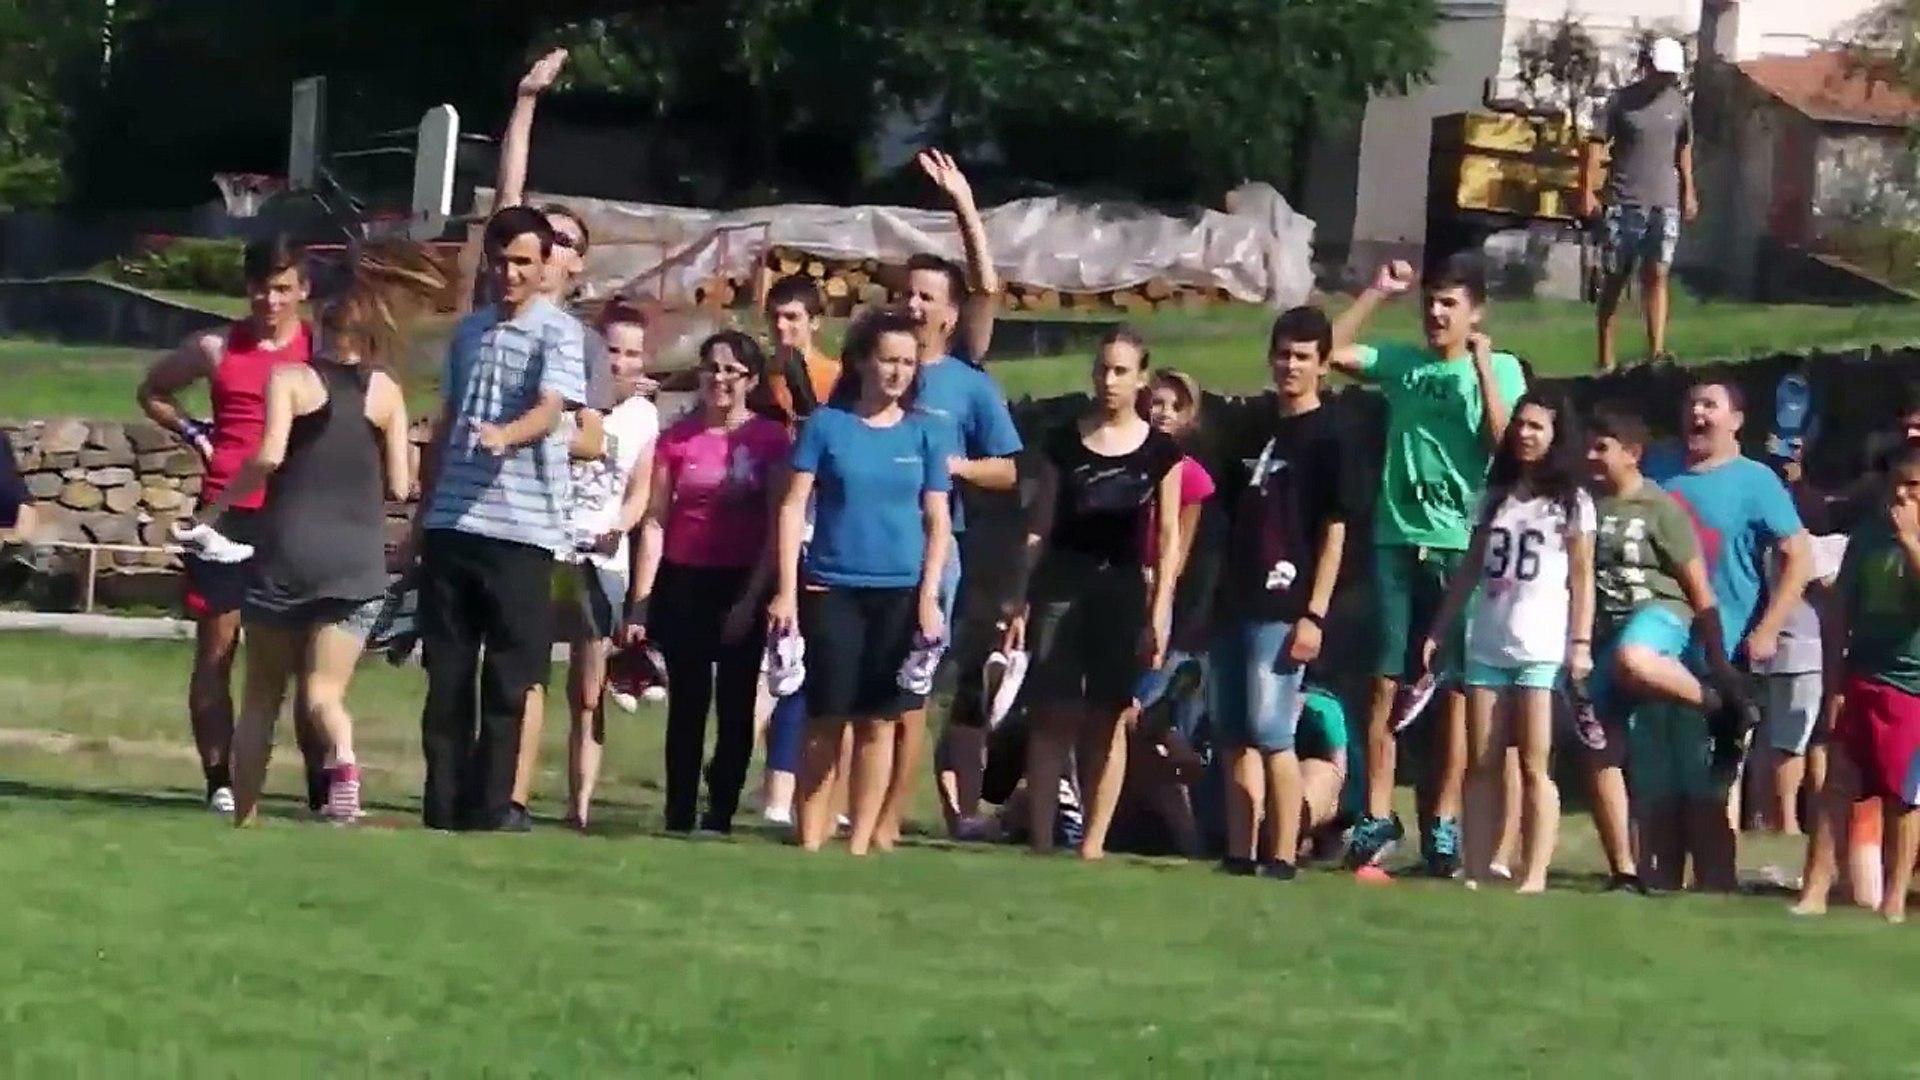 Directie. Tabara MIA / Direction. MIA Camp -  Week 2 Day 1 (07-12 July, 2014)